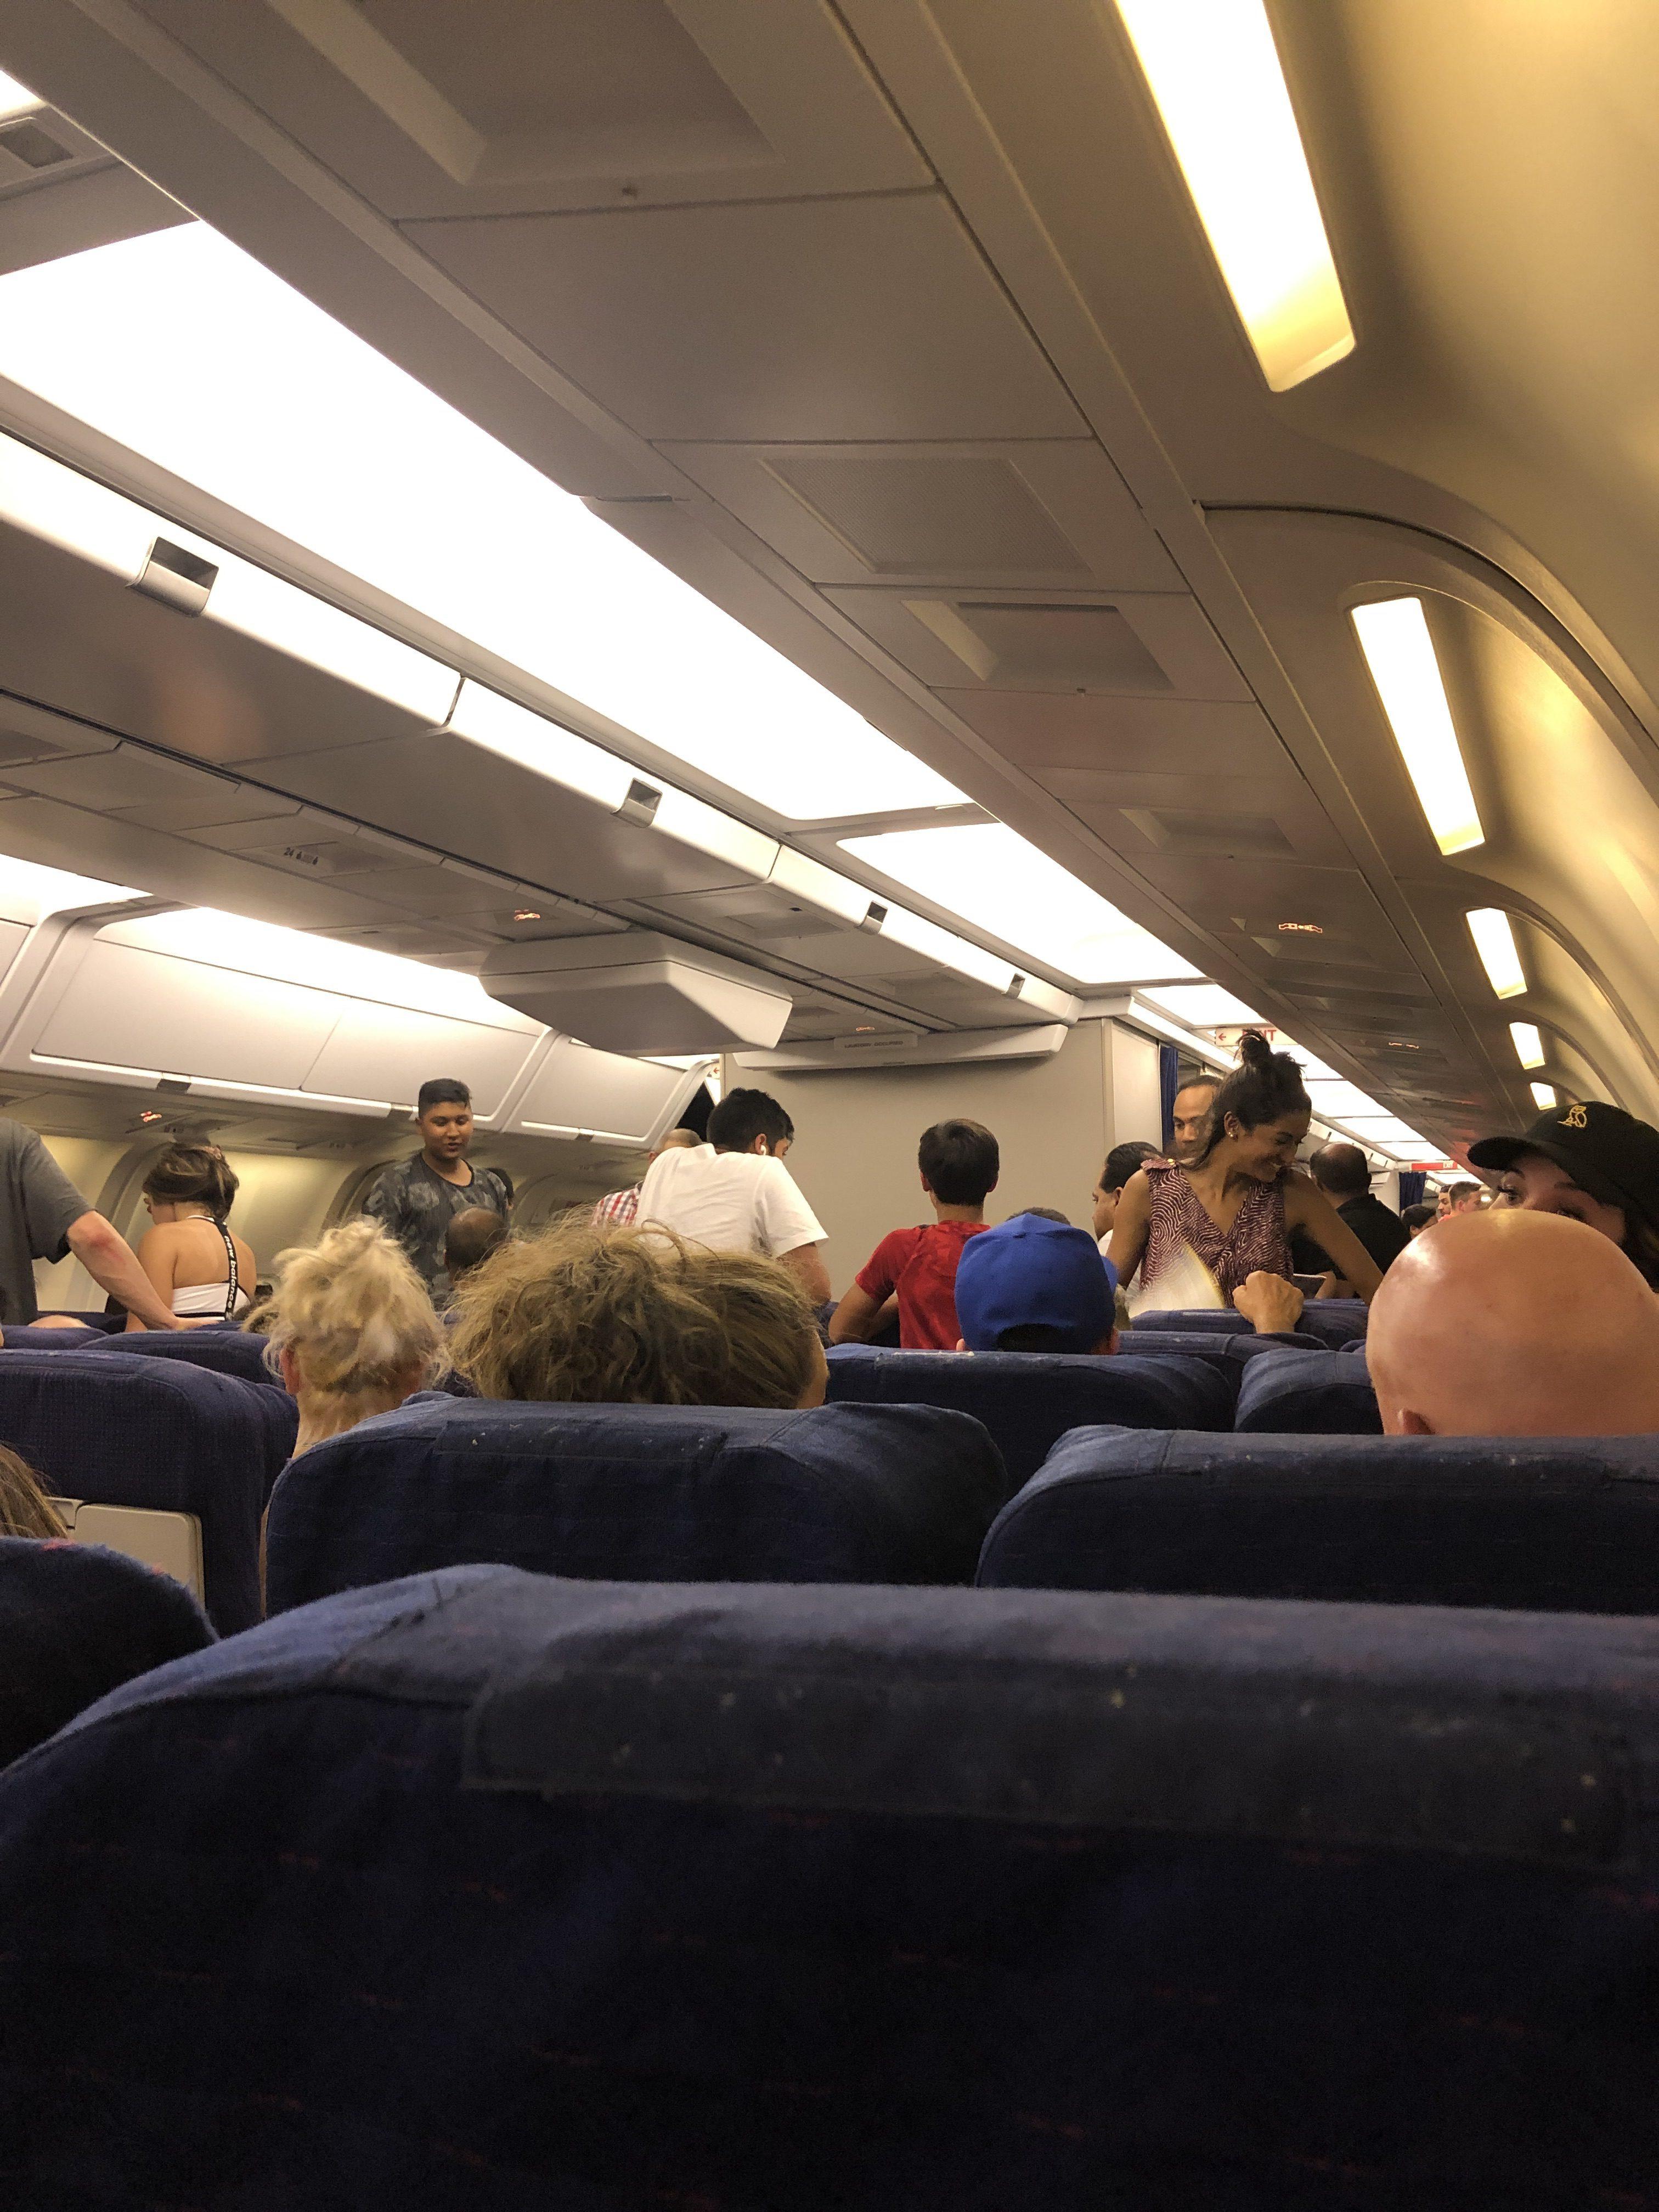 Sunwing Airlines Customer Reviews | SKYTRAX